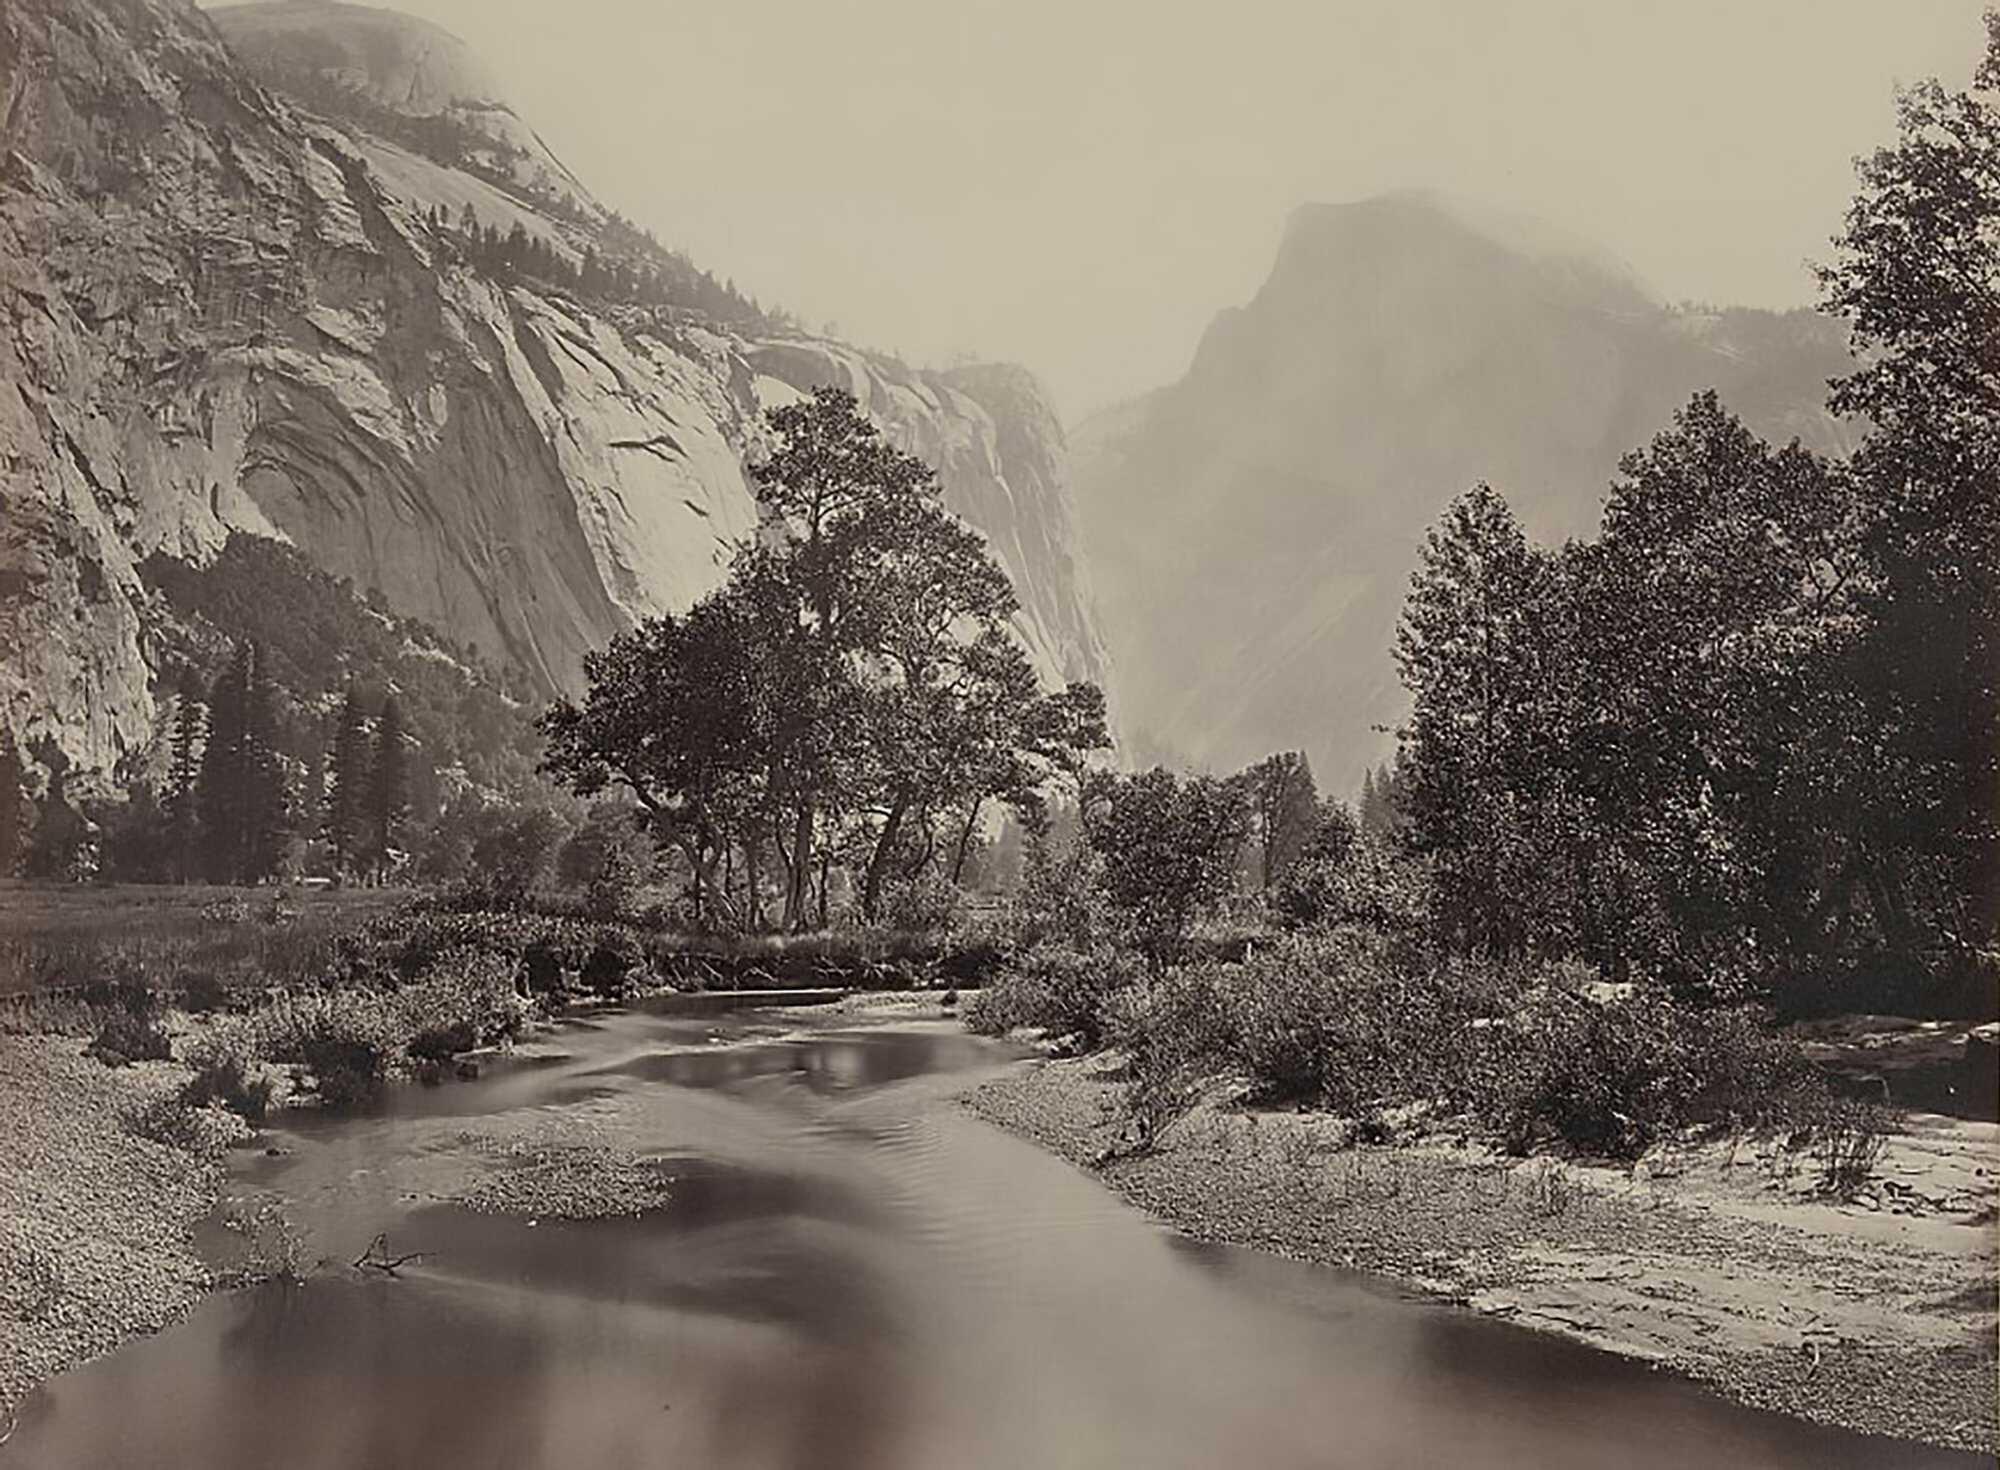 Ansel Ansel Photograh American-Yosemite's-Domes-Watkins,-Carleton-E.,-1829-1916,-photographer-1865-LOC-.jpg